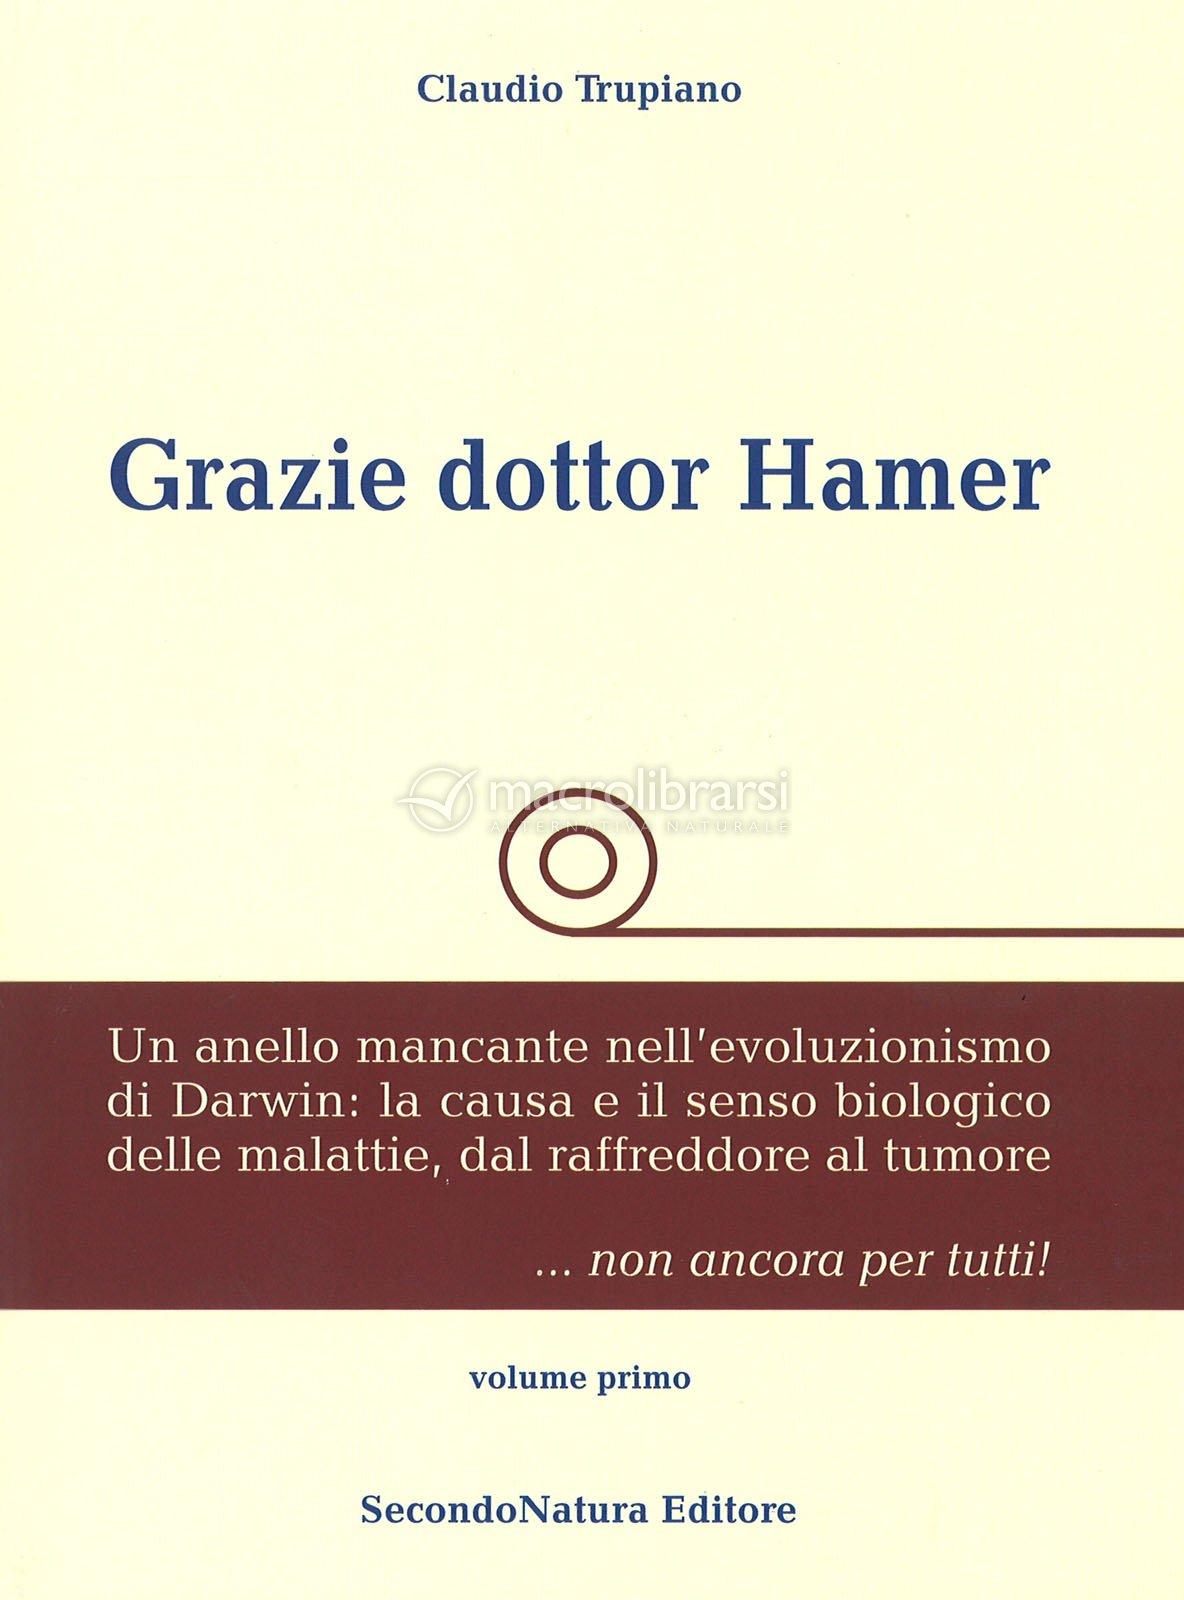 Grazie Dottor Hamer - Vol. 1